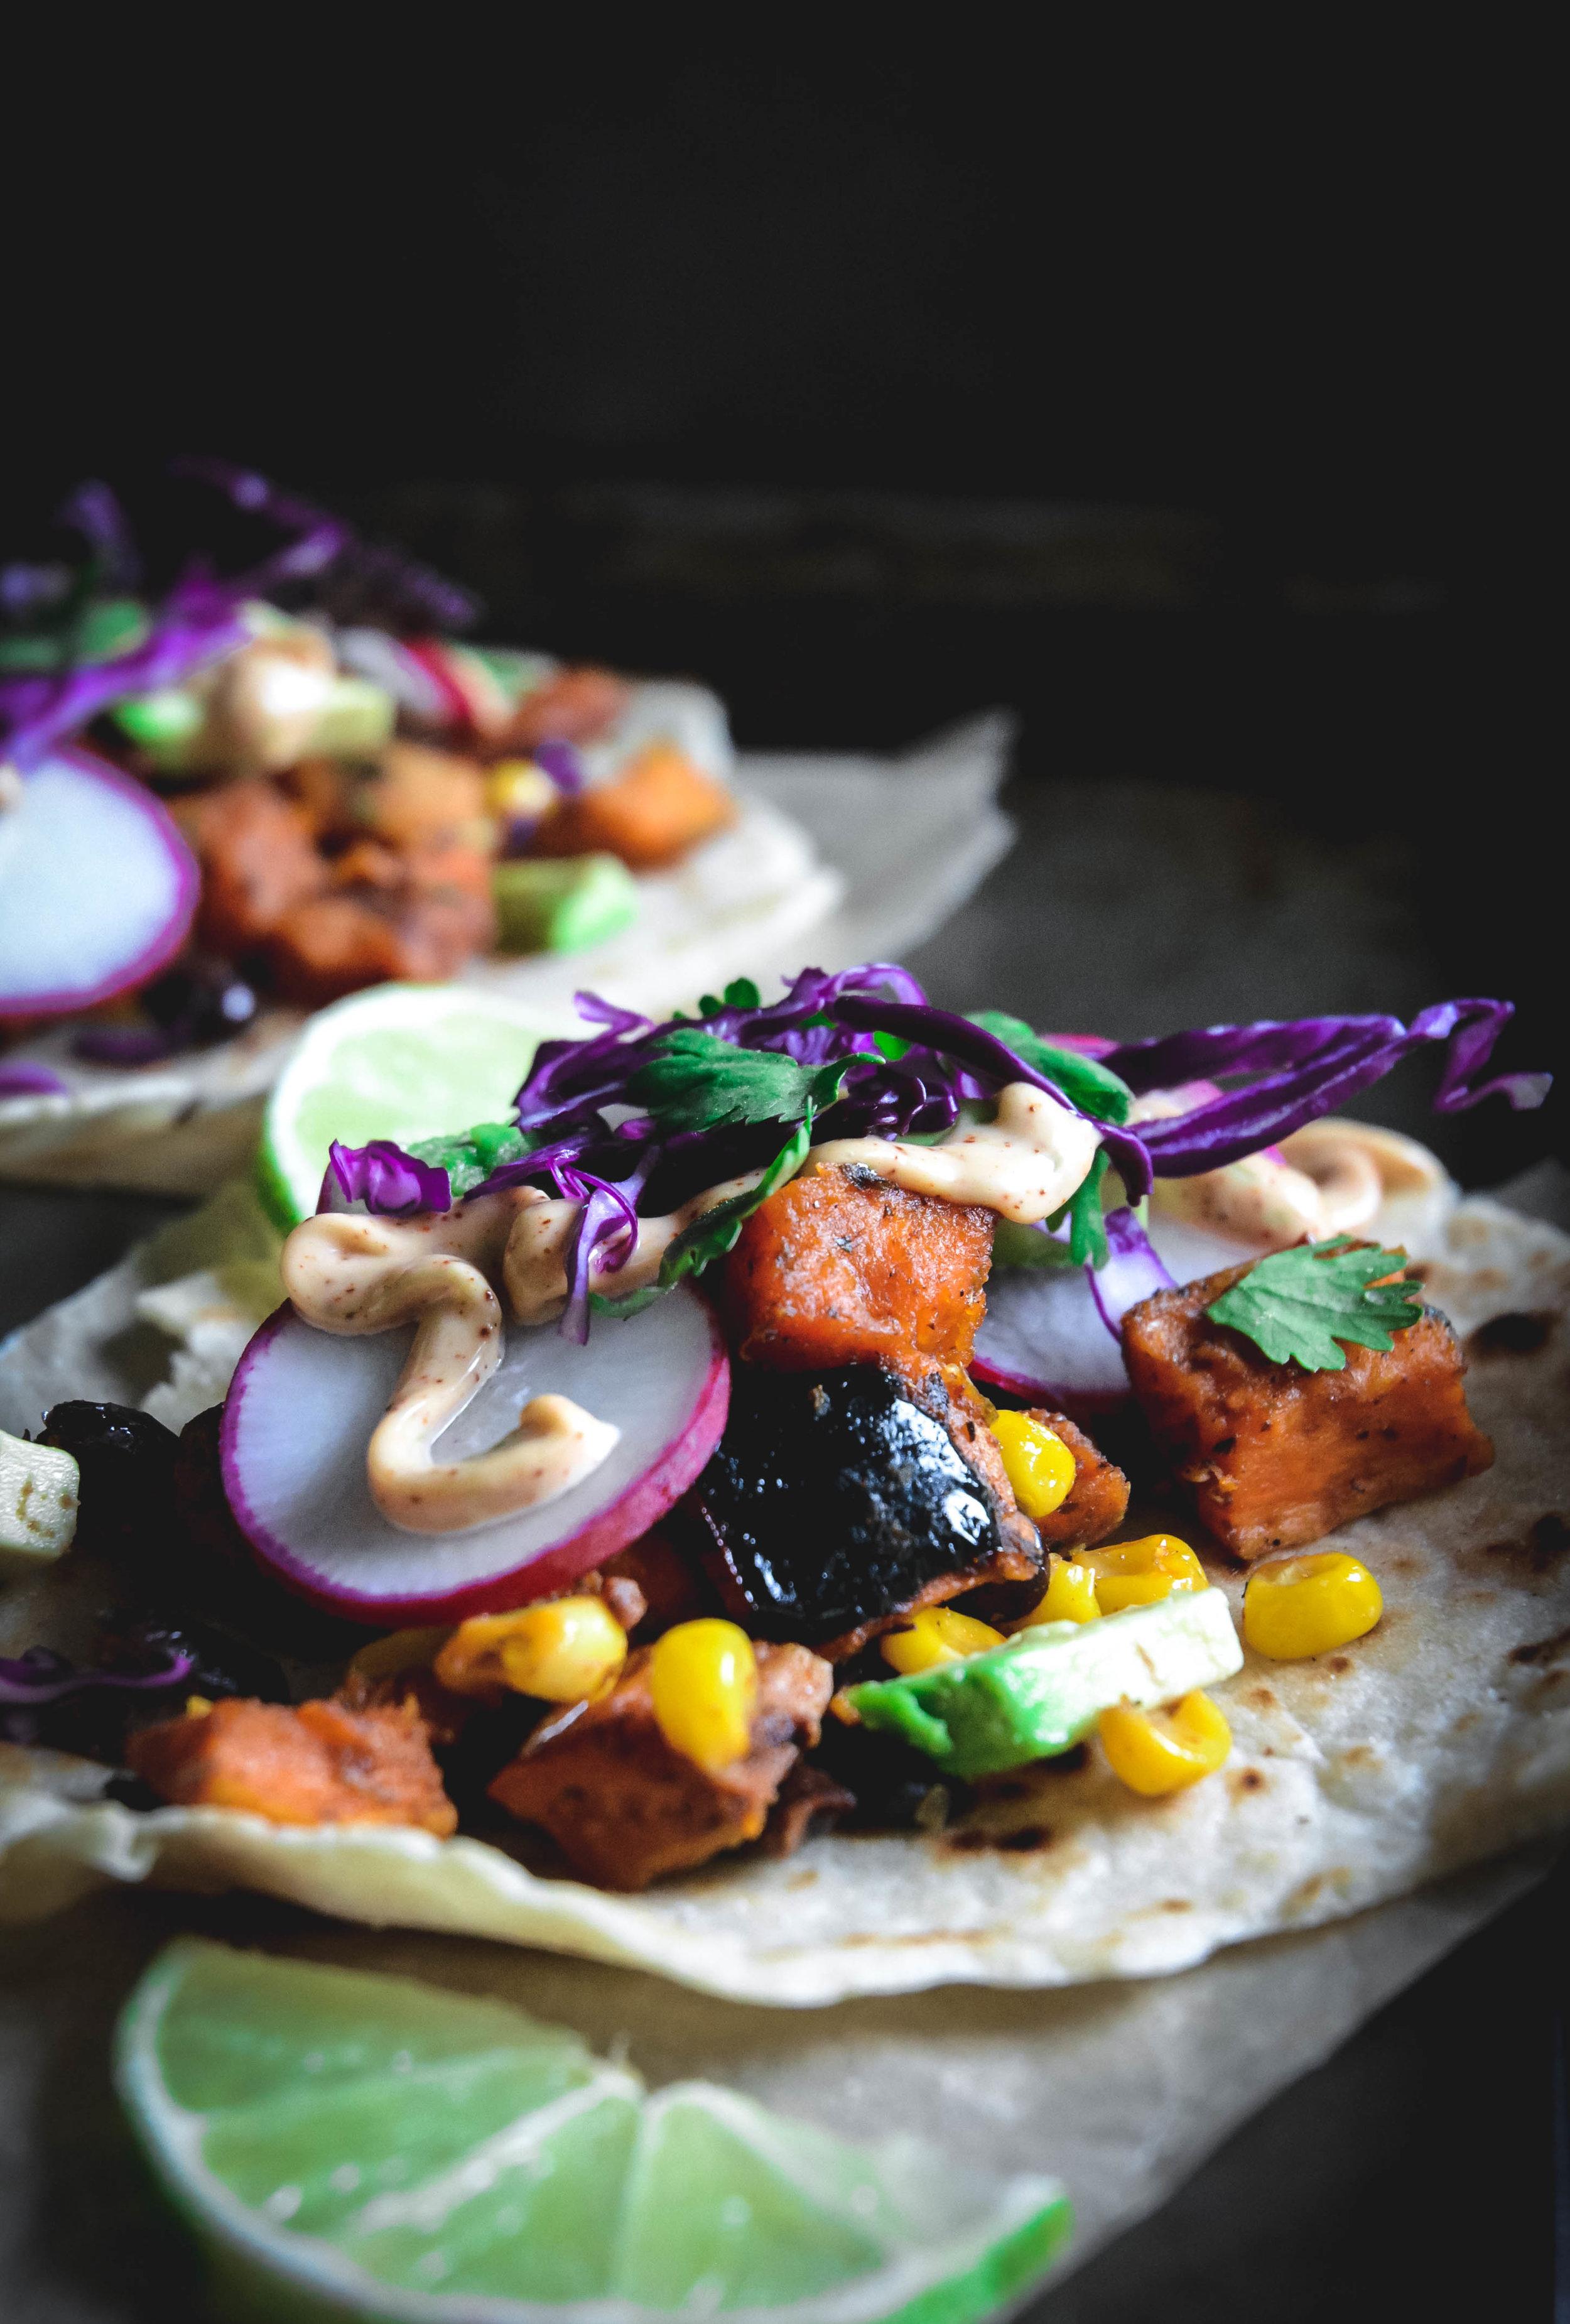 roasted vegetable tacos with radish, avocado, purple cabbage